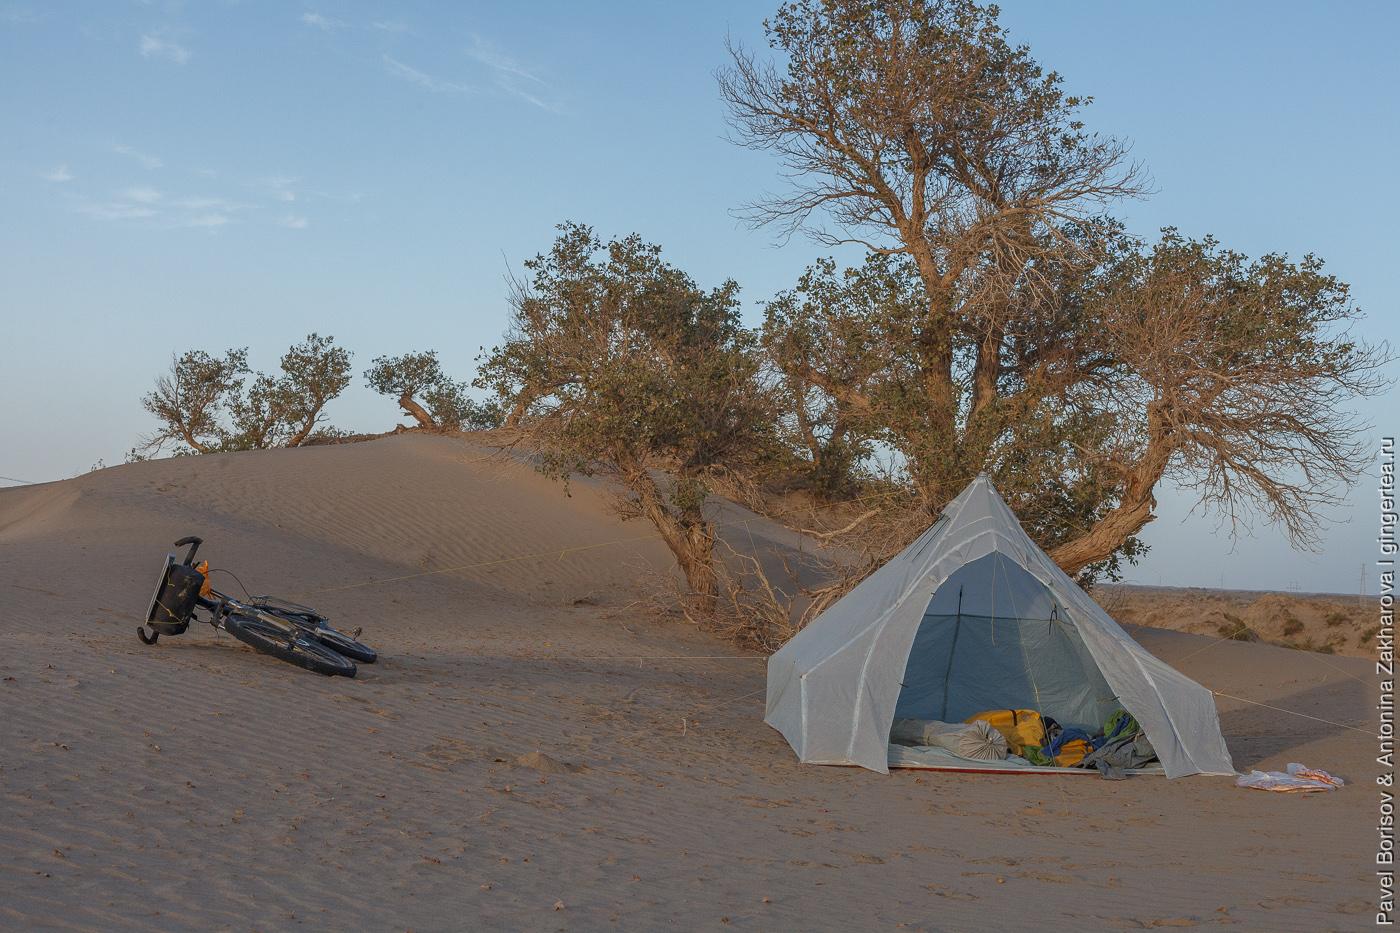 кемпинг в пустыне Такла-Макан